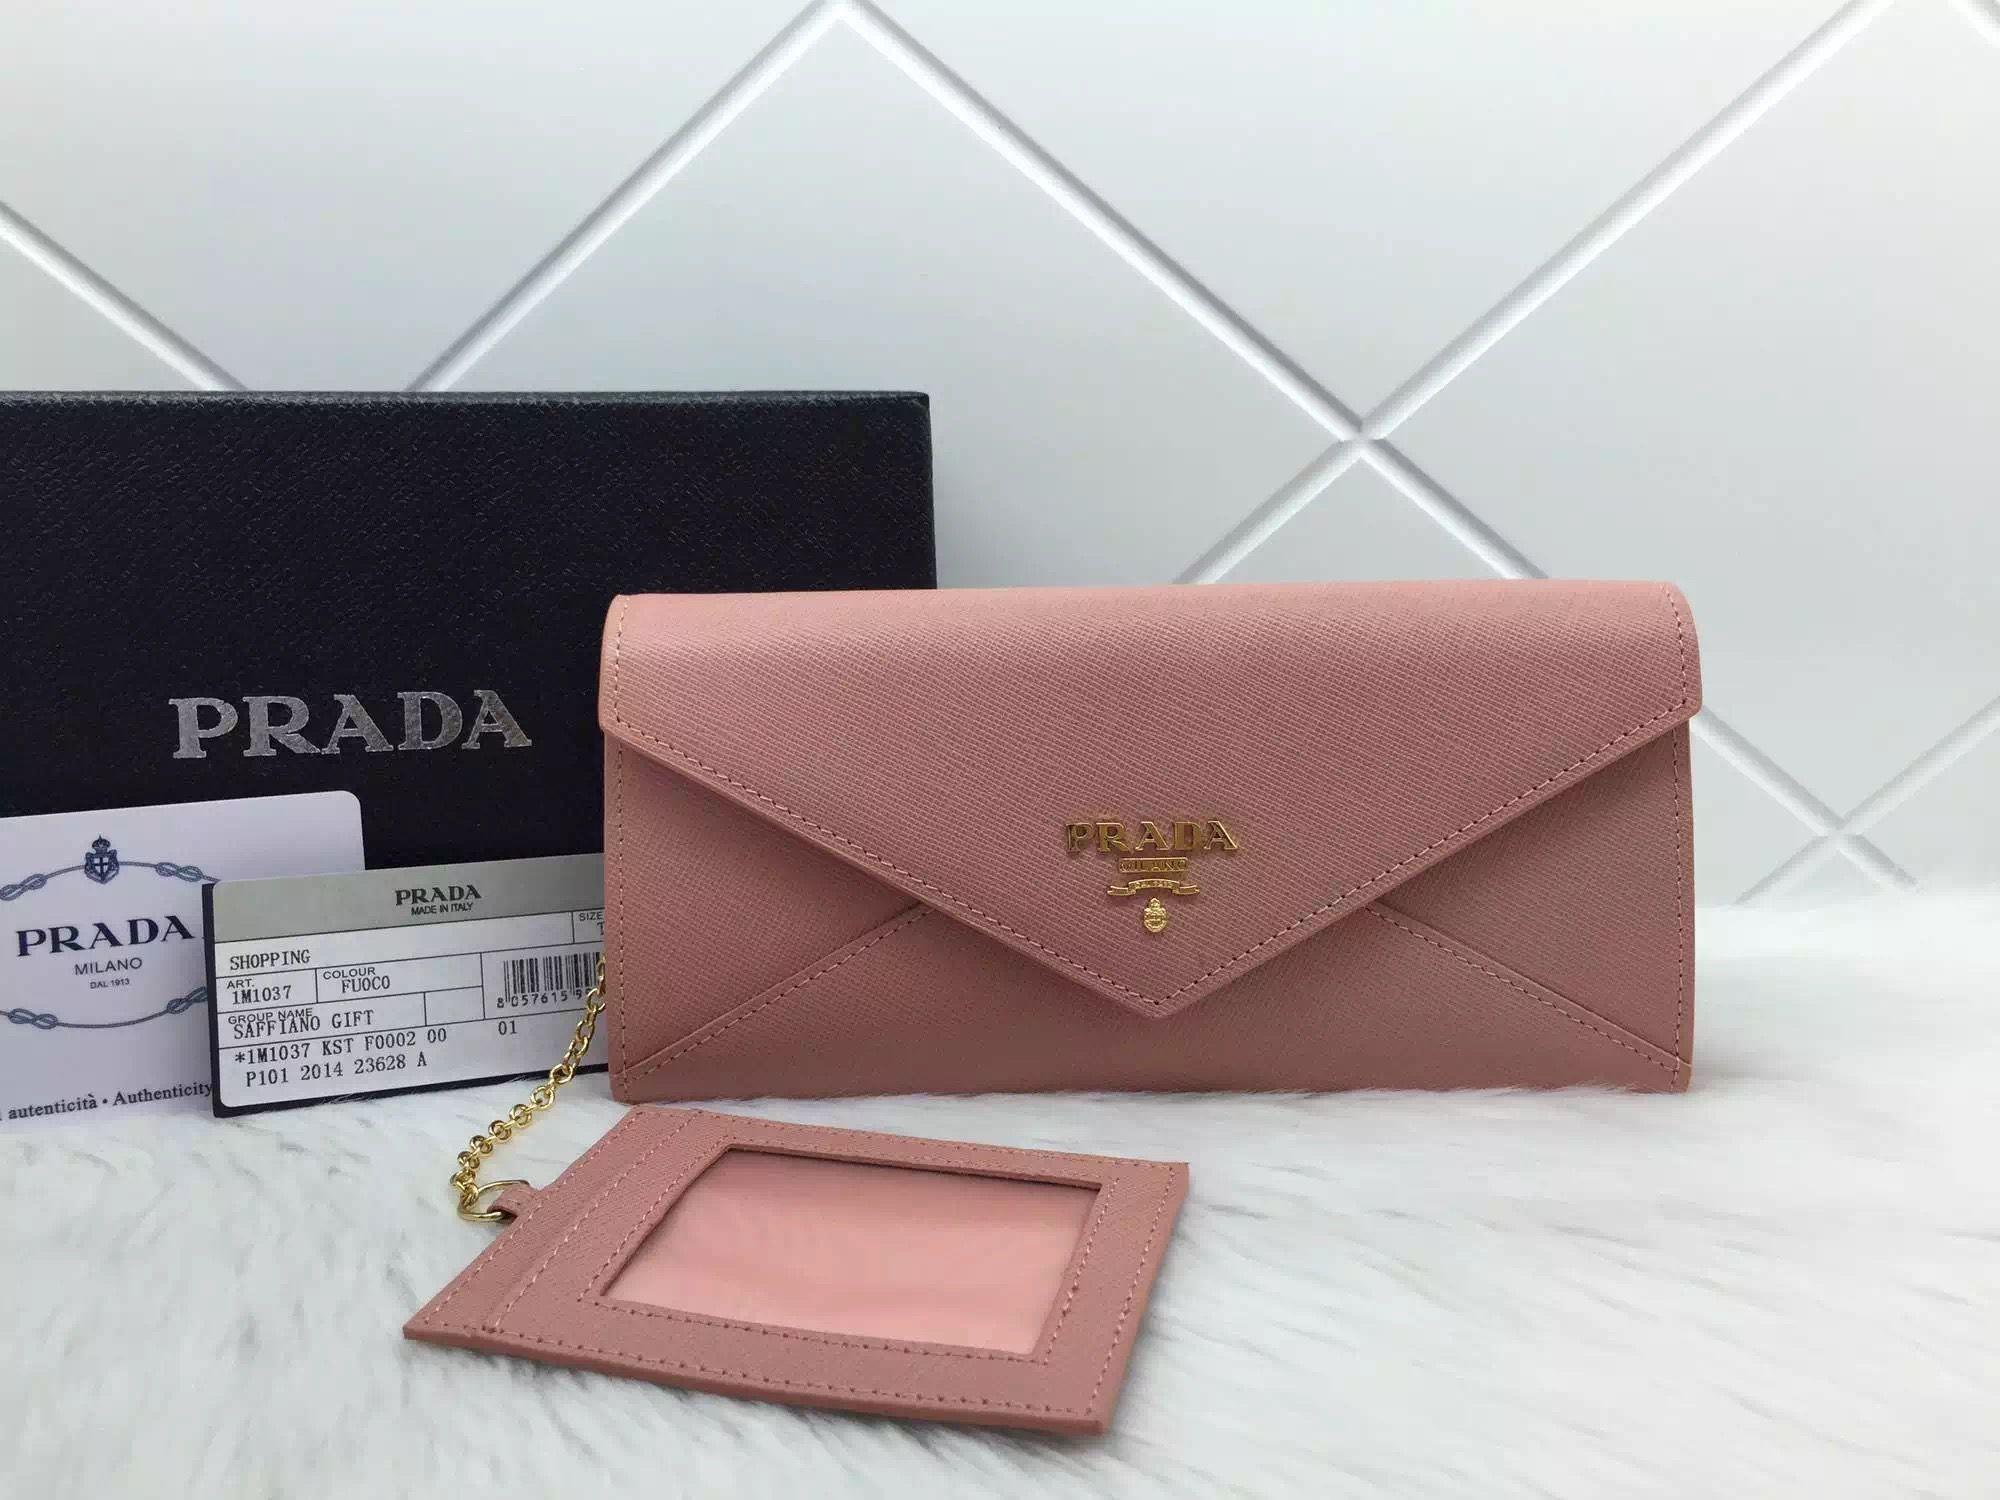 ac20c40e402a20 Prada 1M1037 Saffiano Letter Leather Wallet Nude Pink | Prada Bags ...